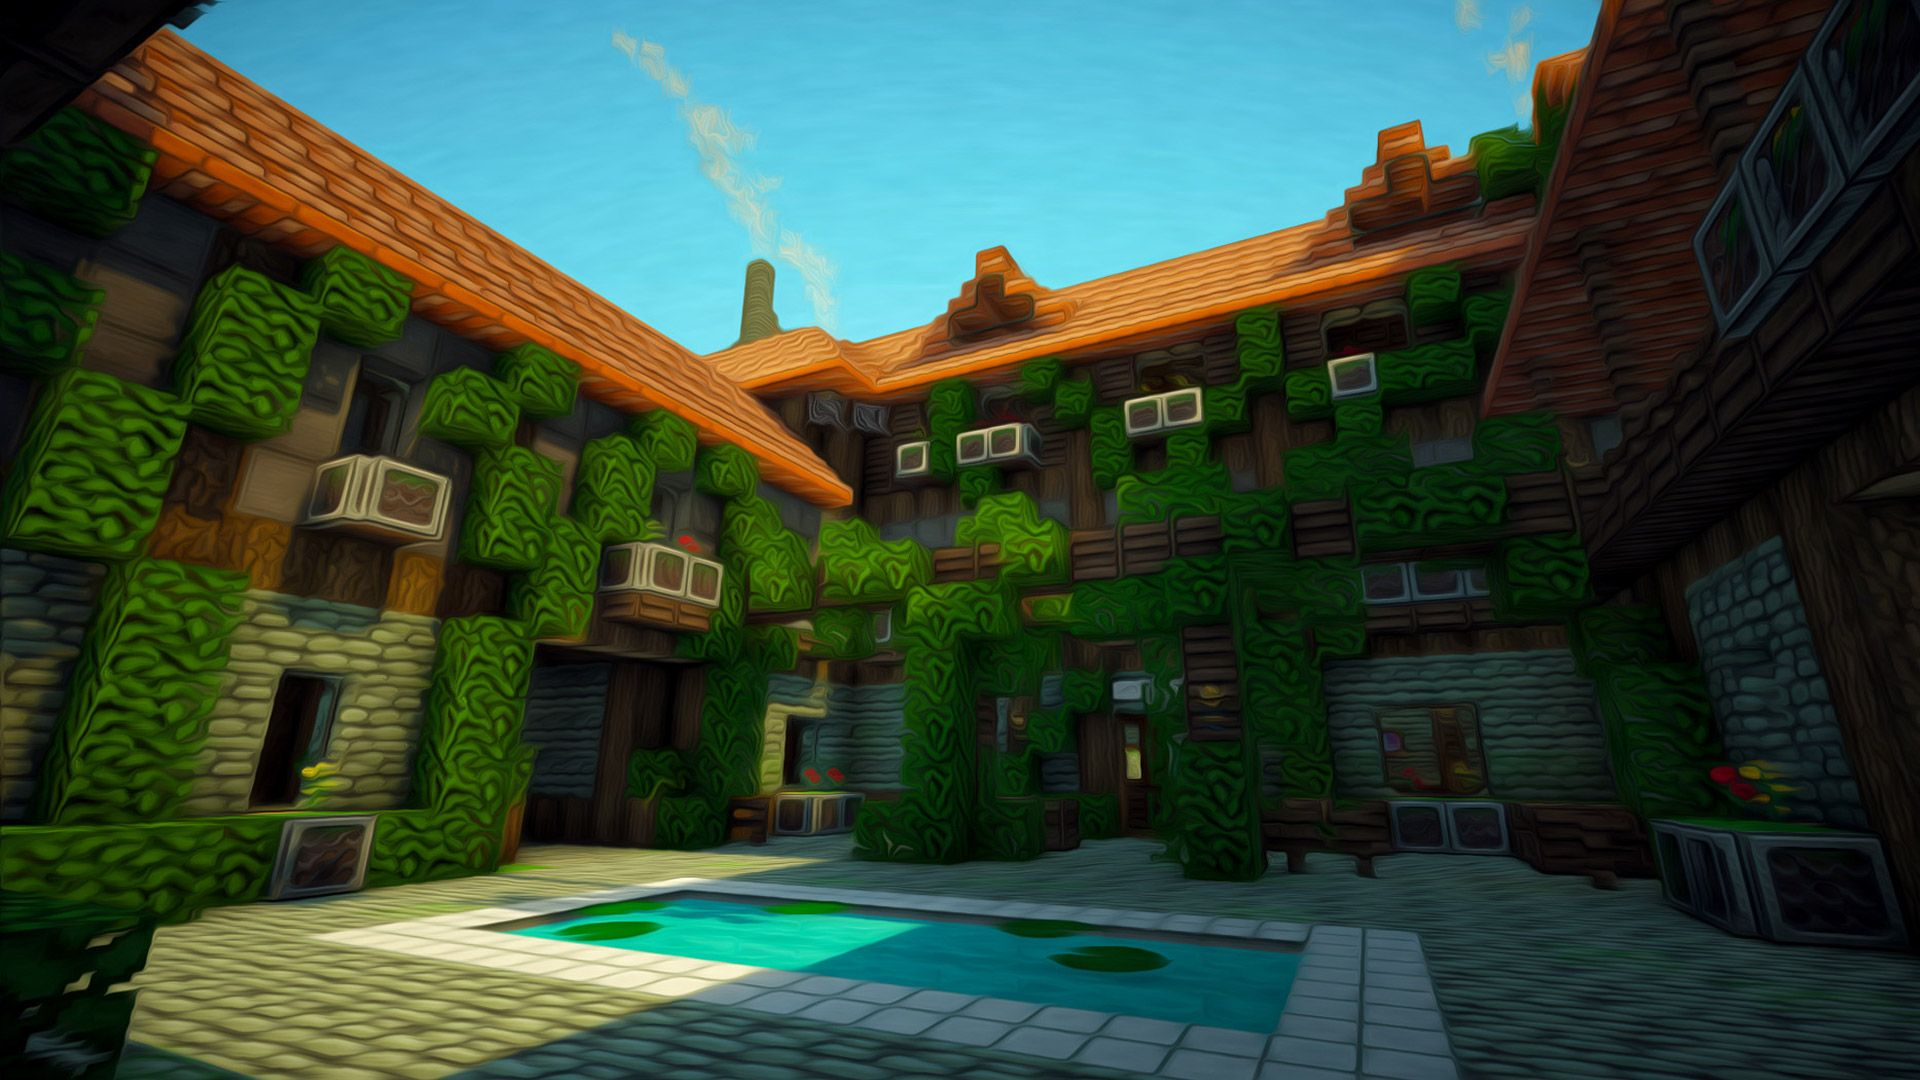 Best Wallpaper Minecraft Love - 03bad1c7c823bd7562bd8a438bcf534c  Image_584781.jpg